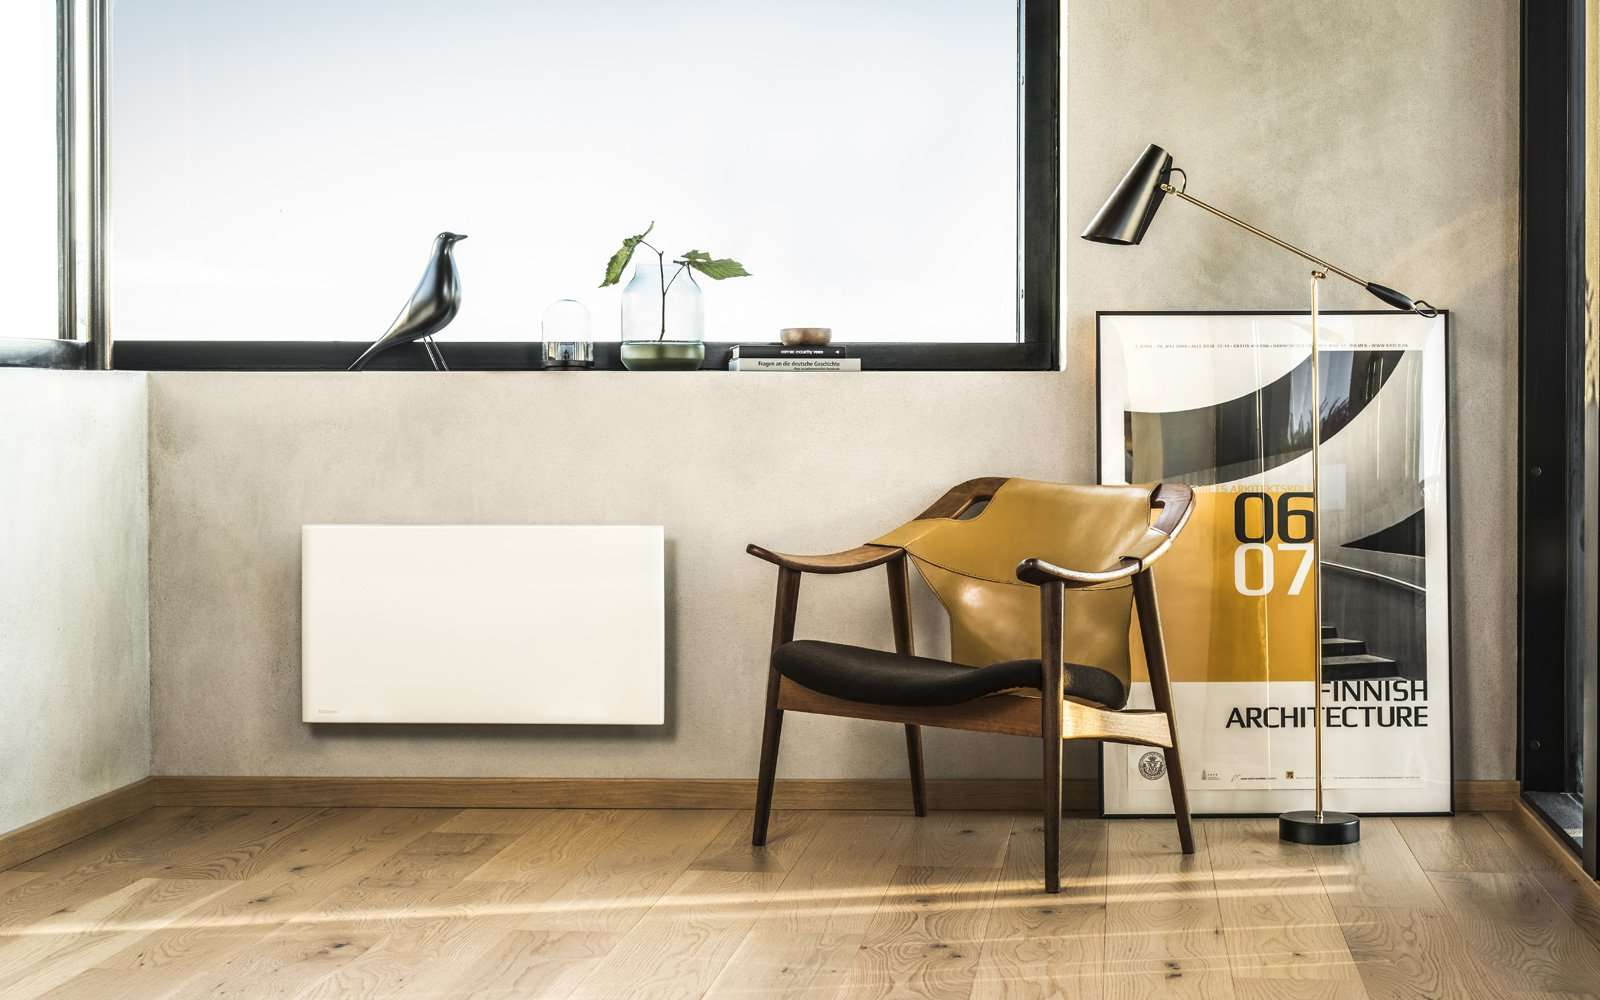 Home riscaldamento elettrico norvegese dimplex for Radiatori elettrici norvegesi